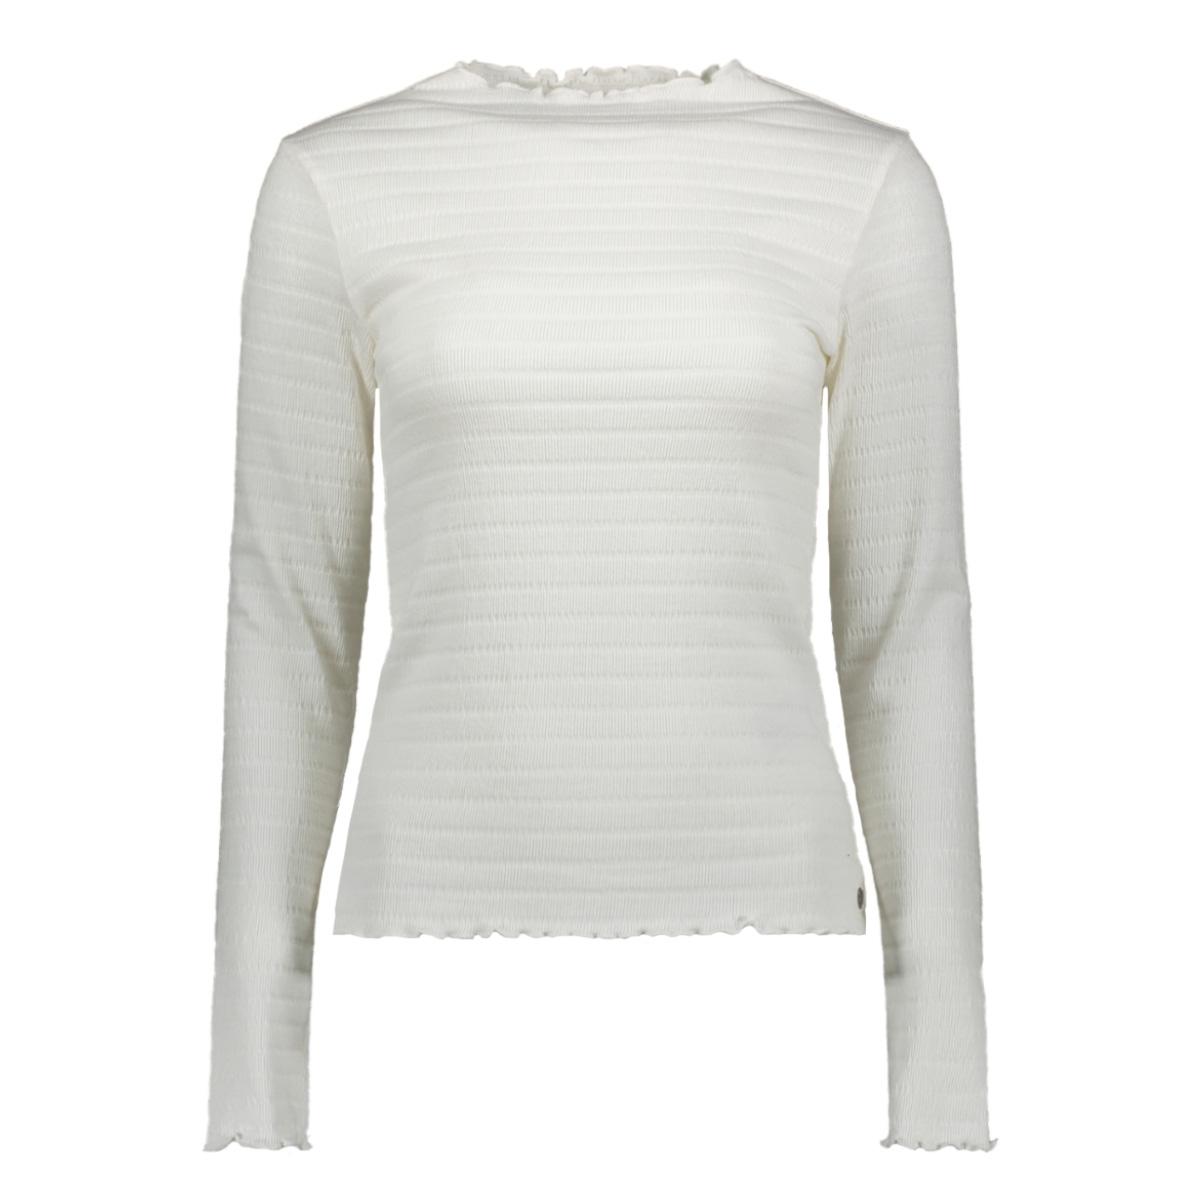 longsleeve tshirt j90206 garcia t-shirt 53 off white